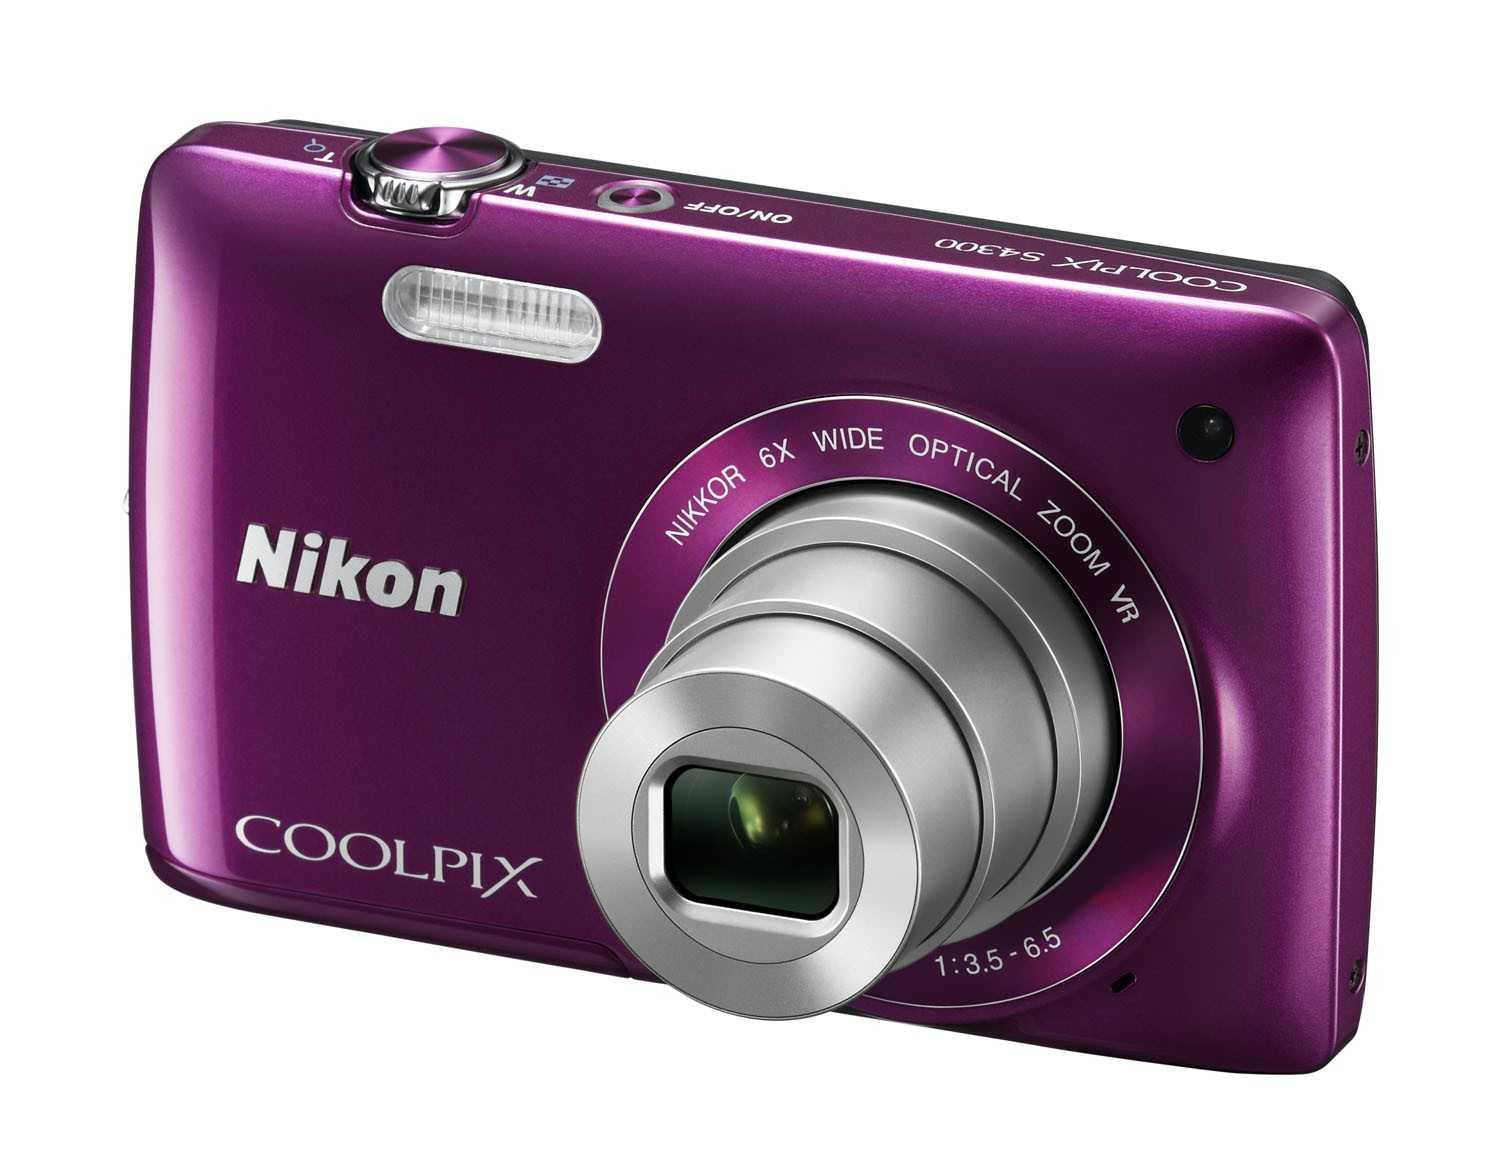 Nikon S2800 Jpg